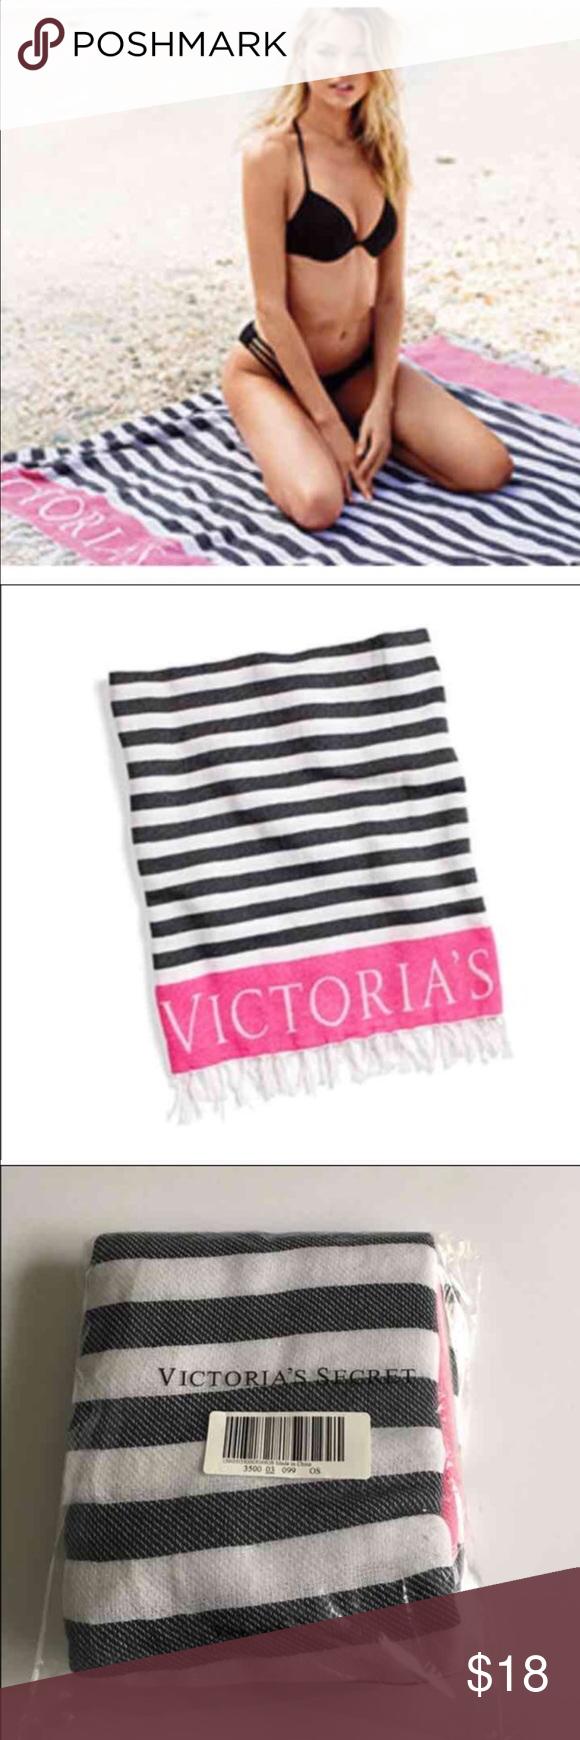 "Victoria's Secret beach blanket new Brand new in original bag measurements 50""X60"" PINK Victoria's Secret Accessories"